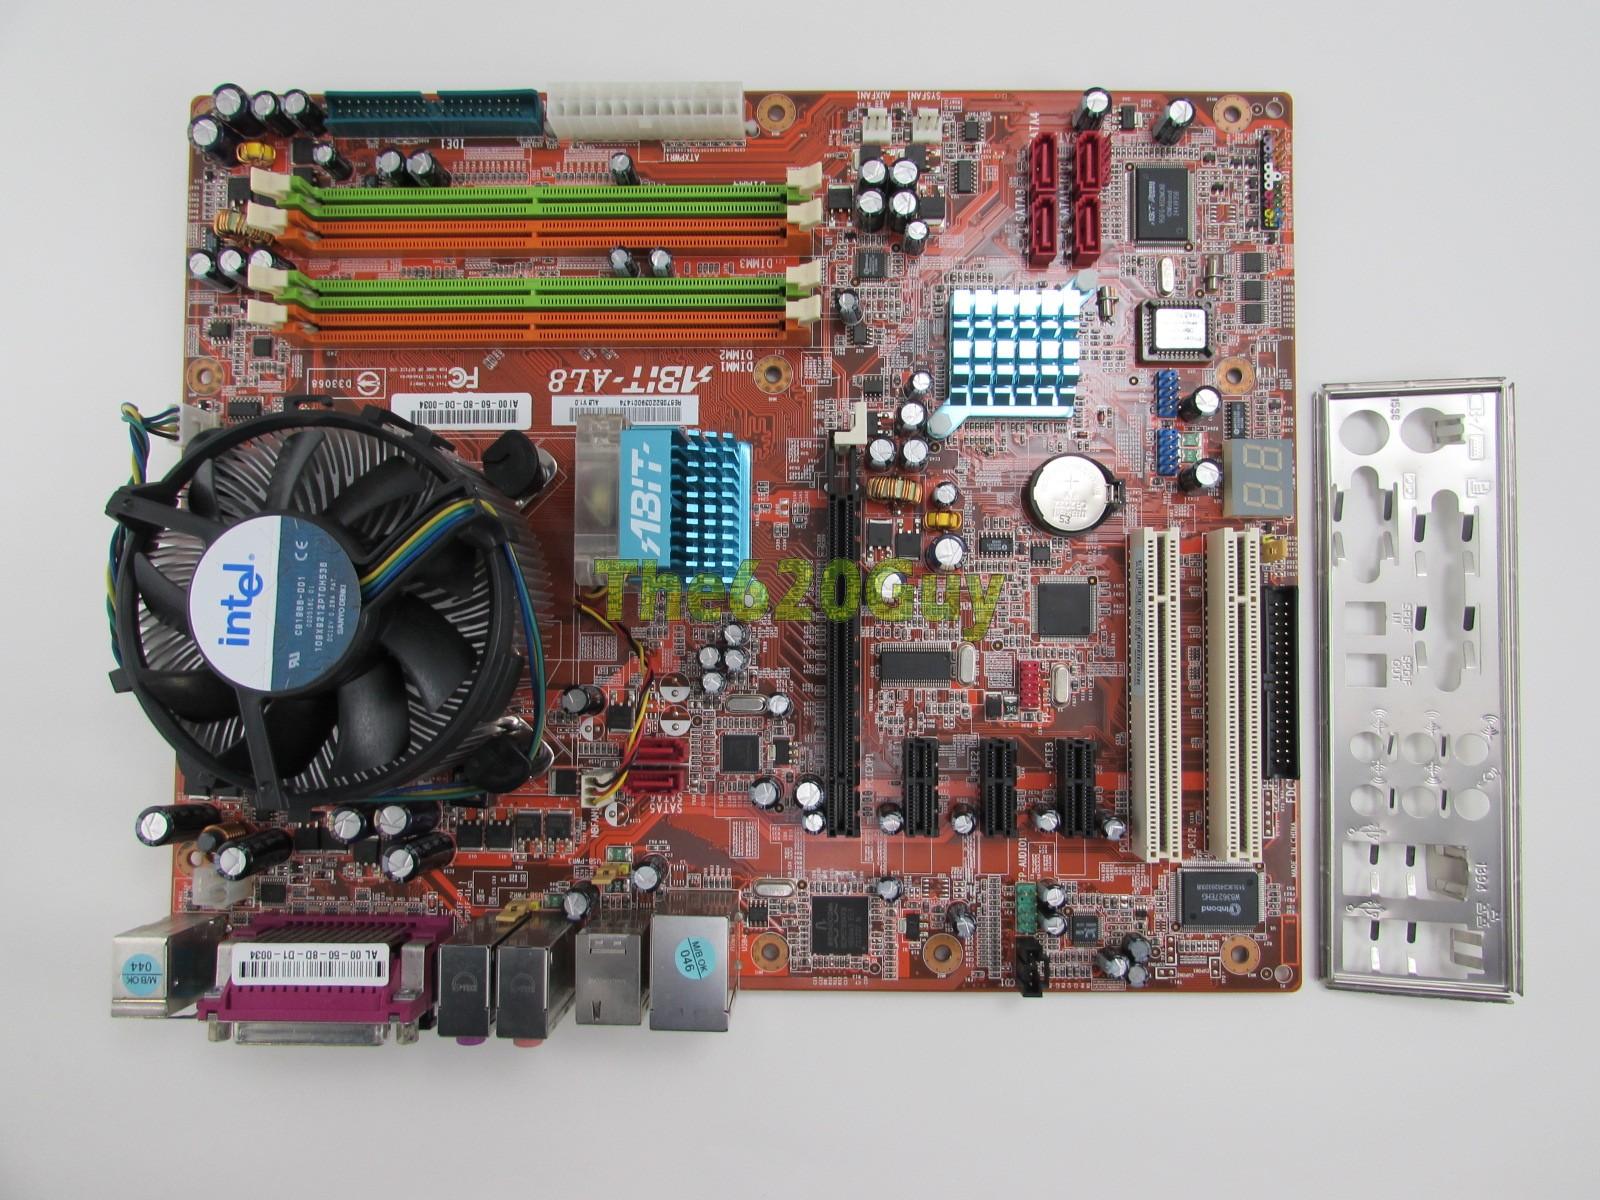 Intel Pentium 4 Chipset Drivers Download